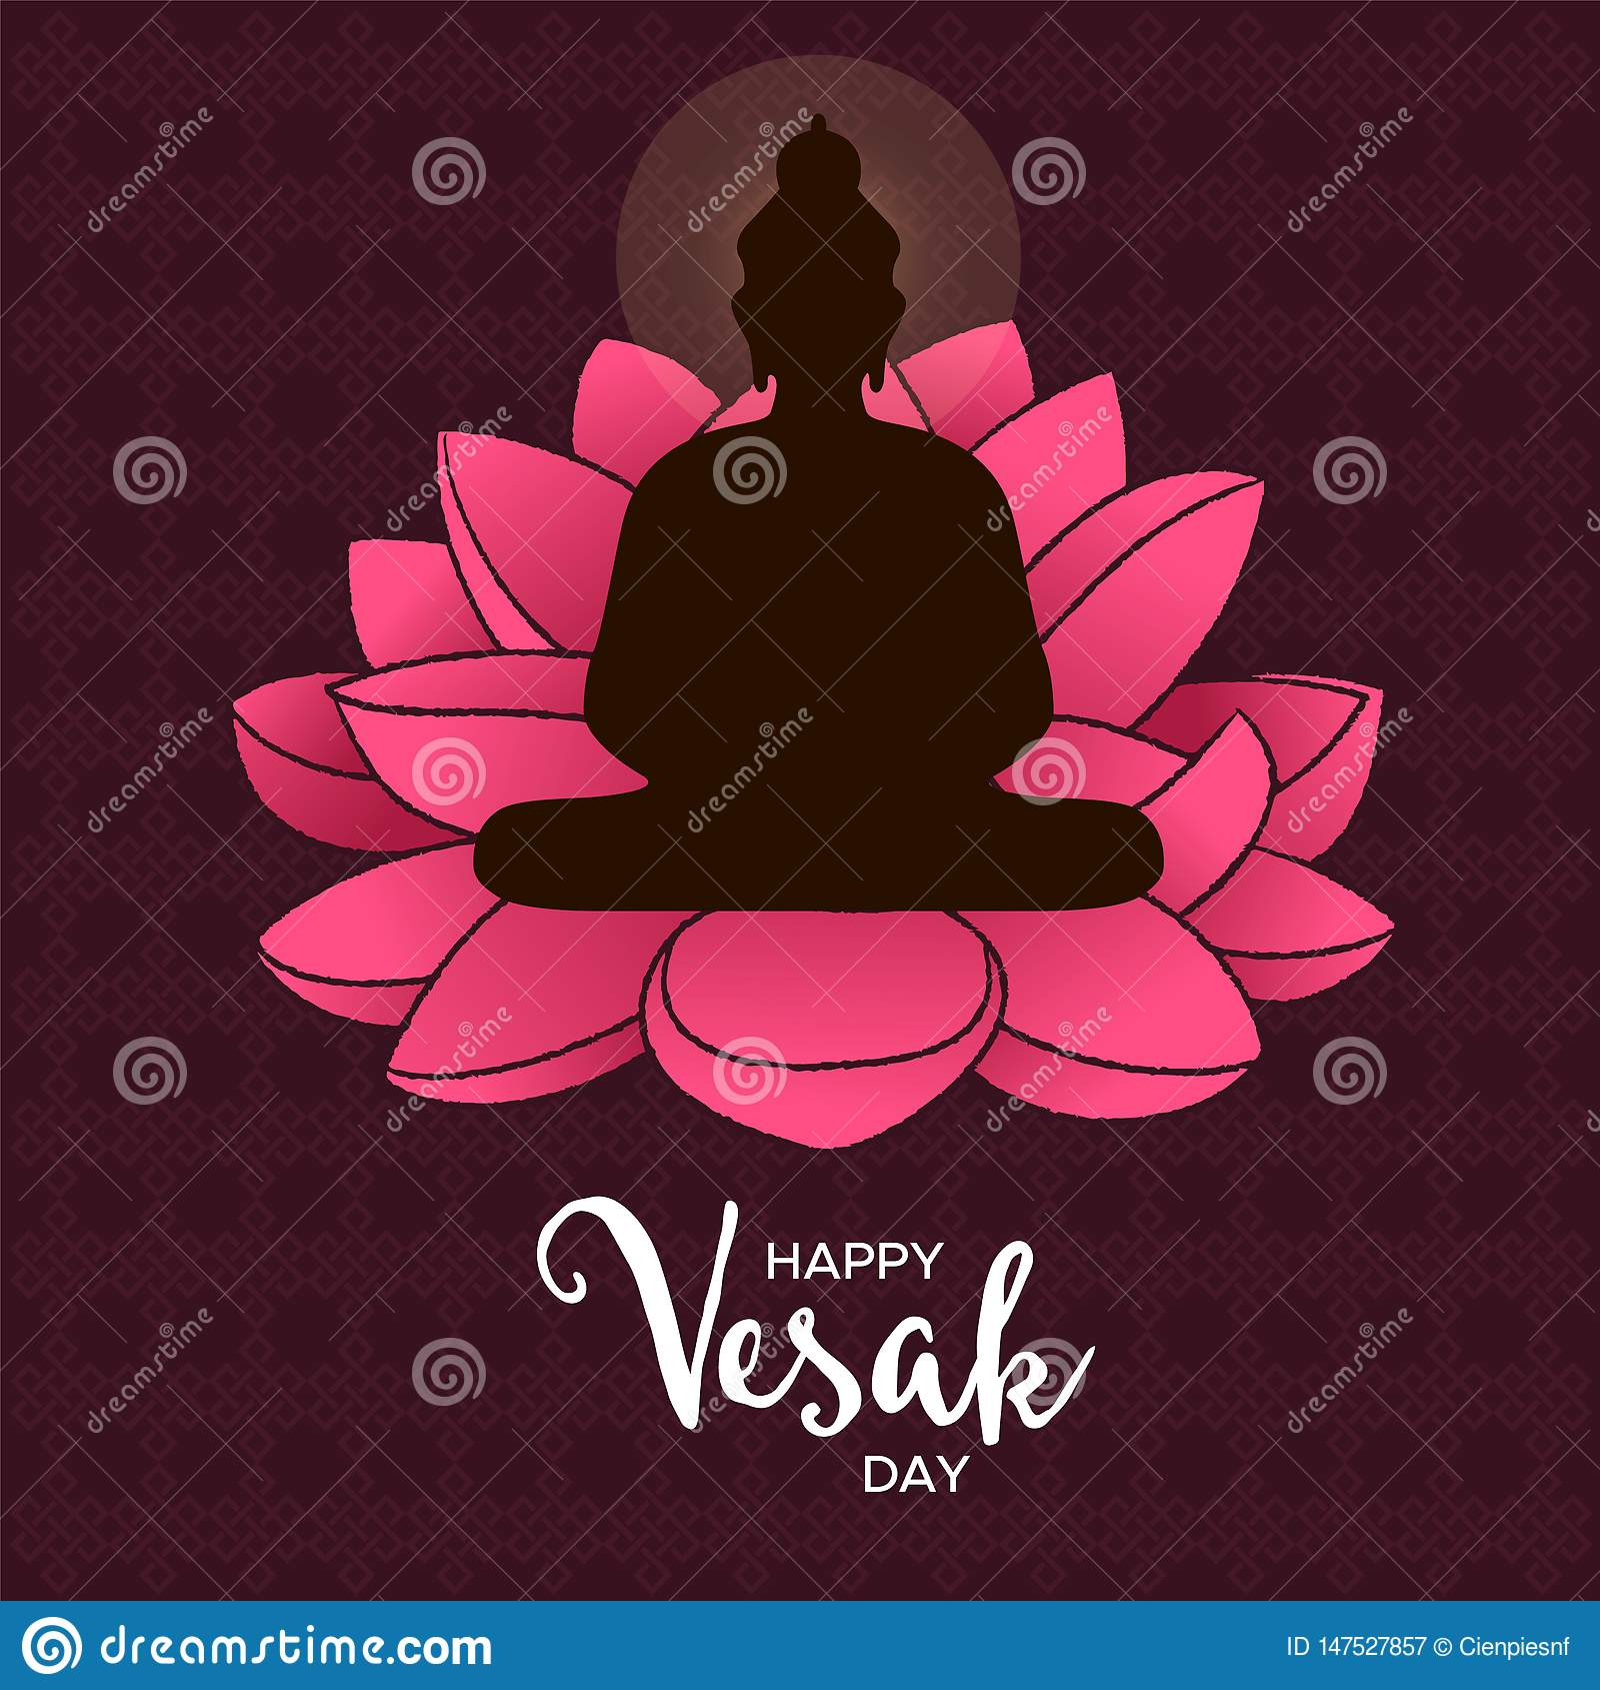 vesak day card of buddha and pink lotus flower stock vector